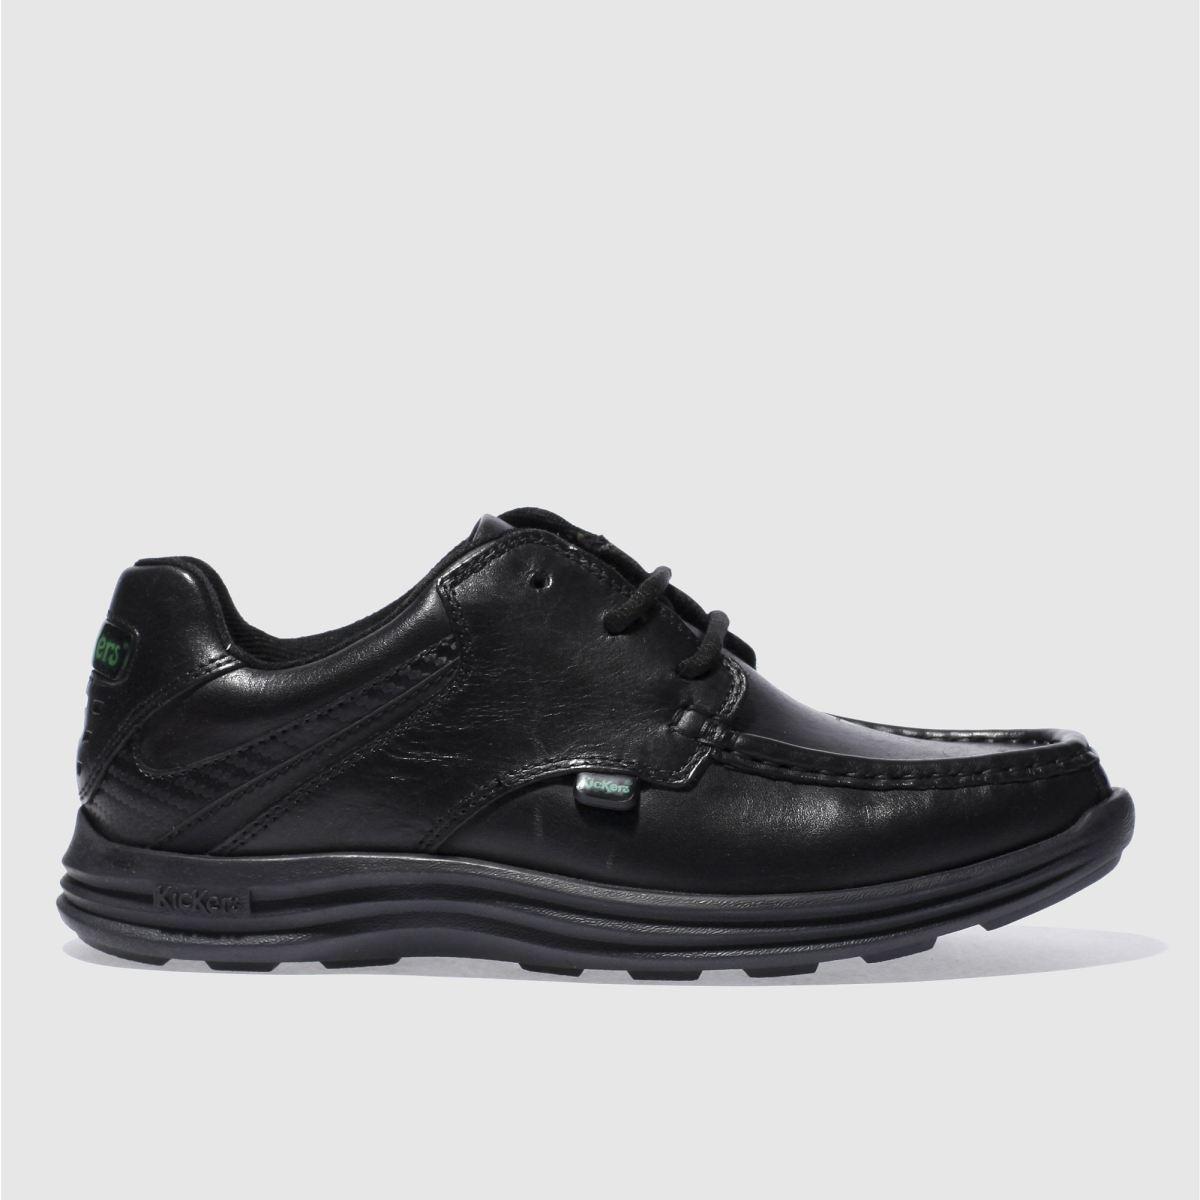 Kickers Black Reasan Lace Shoes Youth